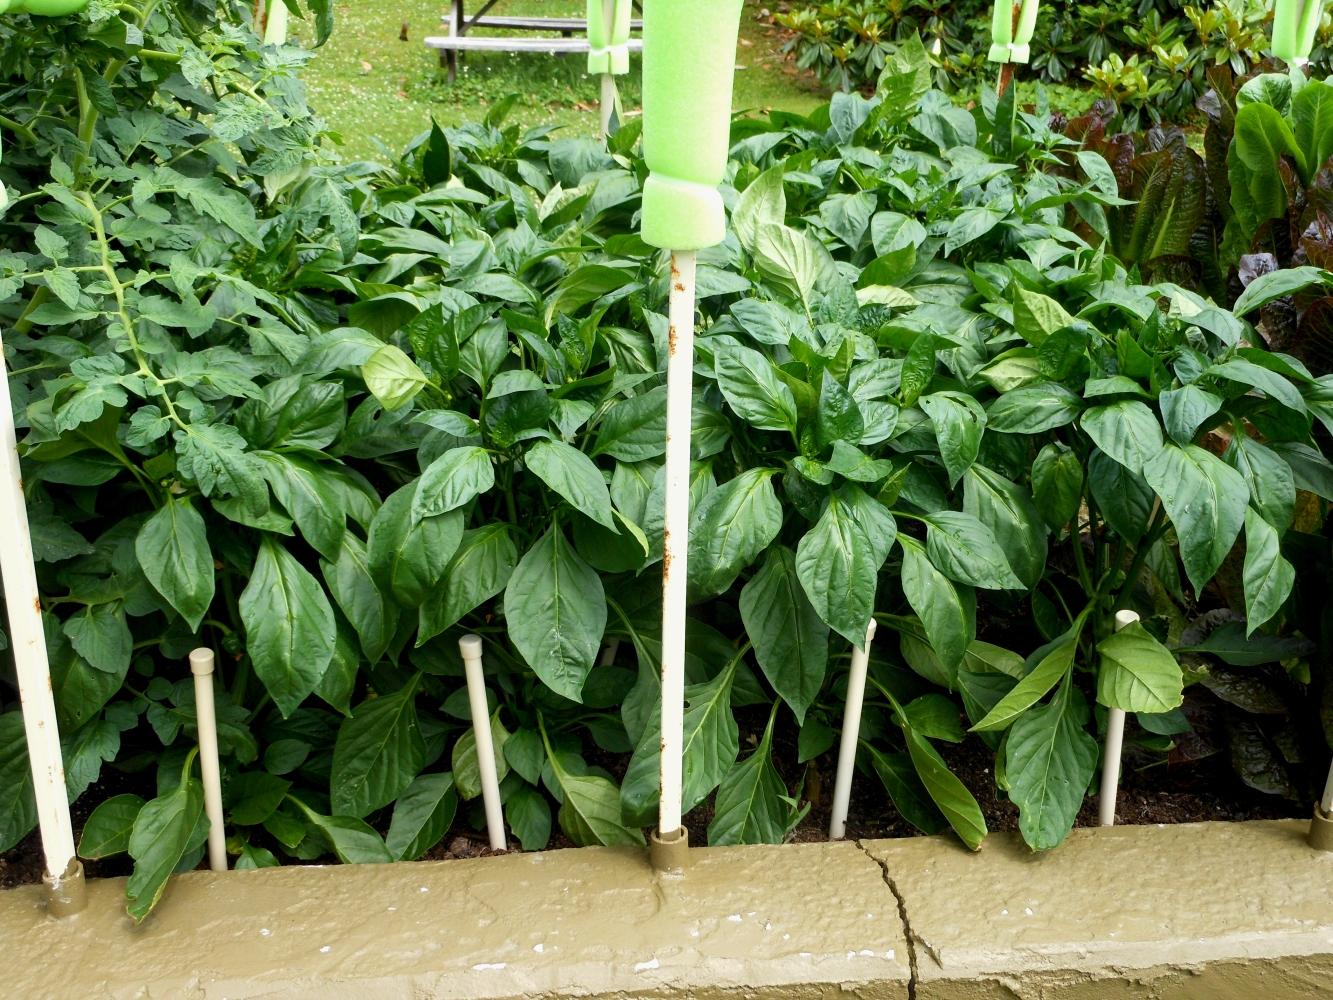 05-28-14_Bell_Pepper_Plants